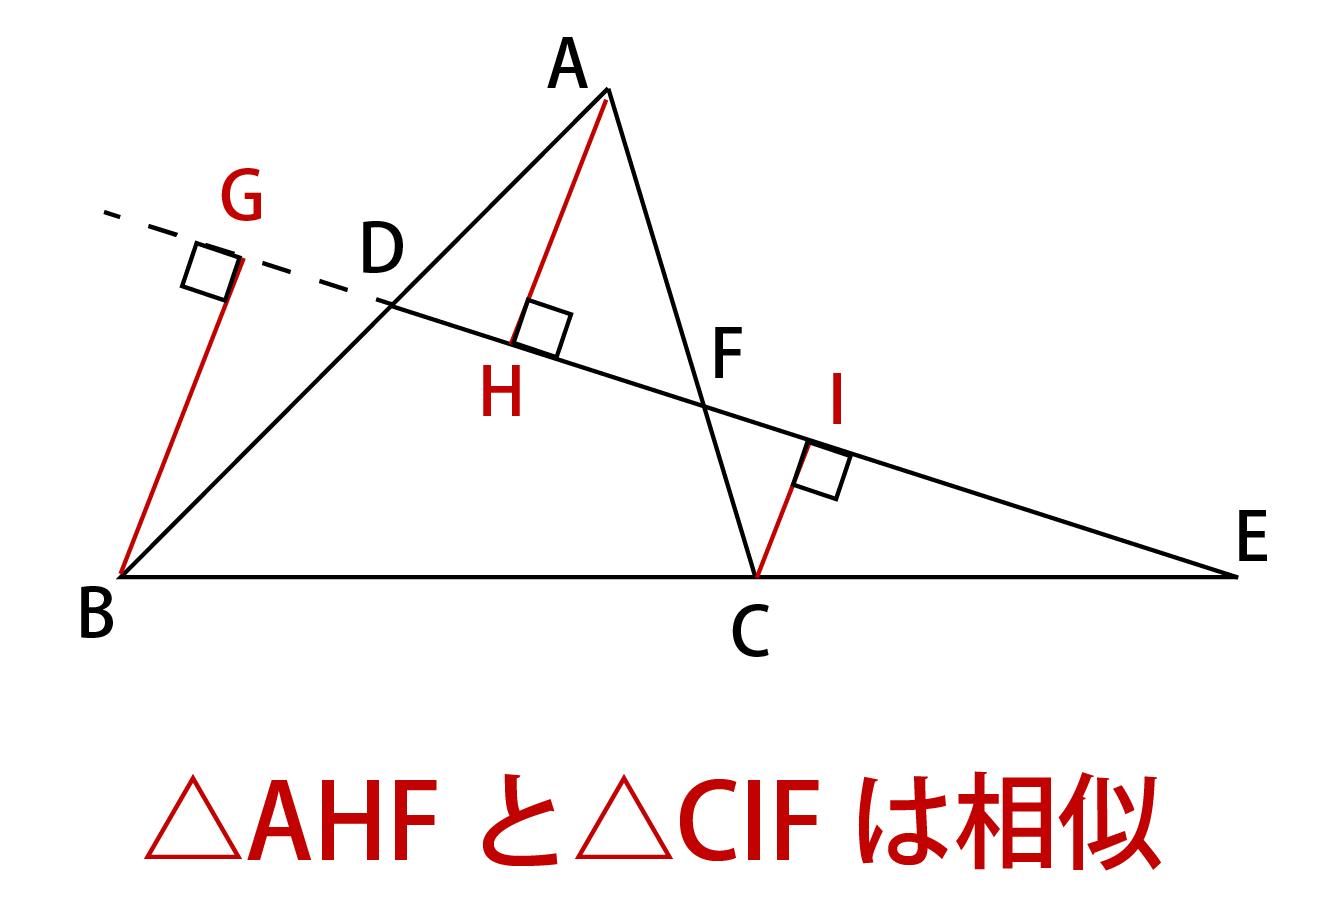 △AHFと△CIFは相似